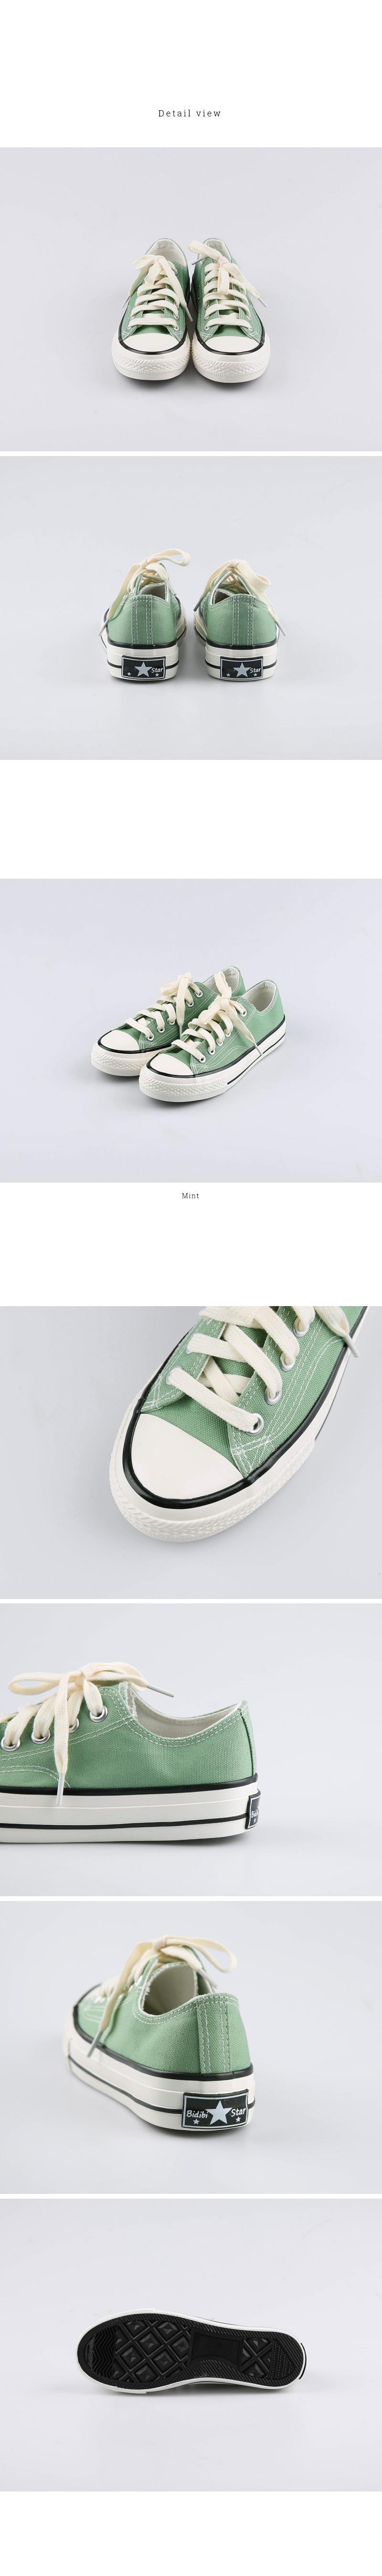 Horse sneakers